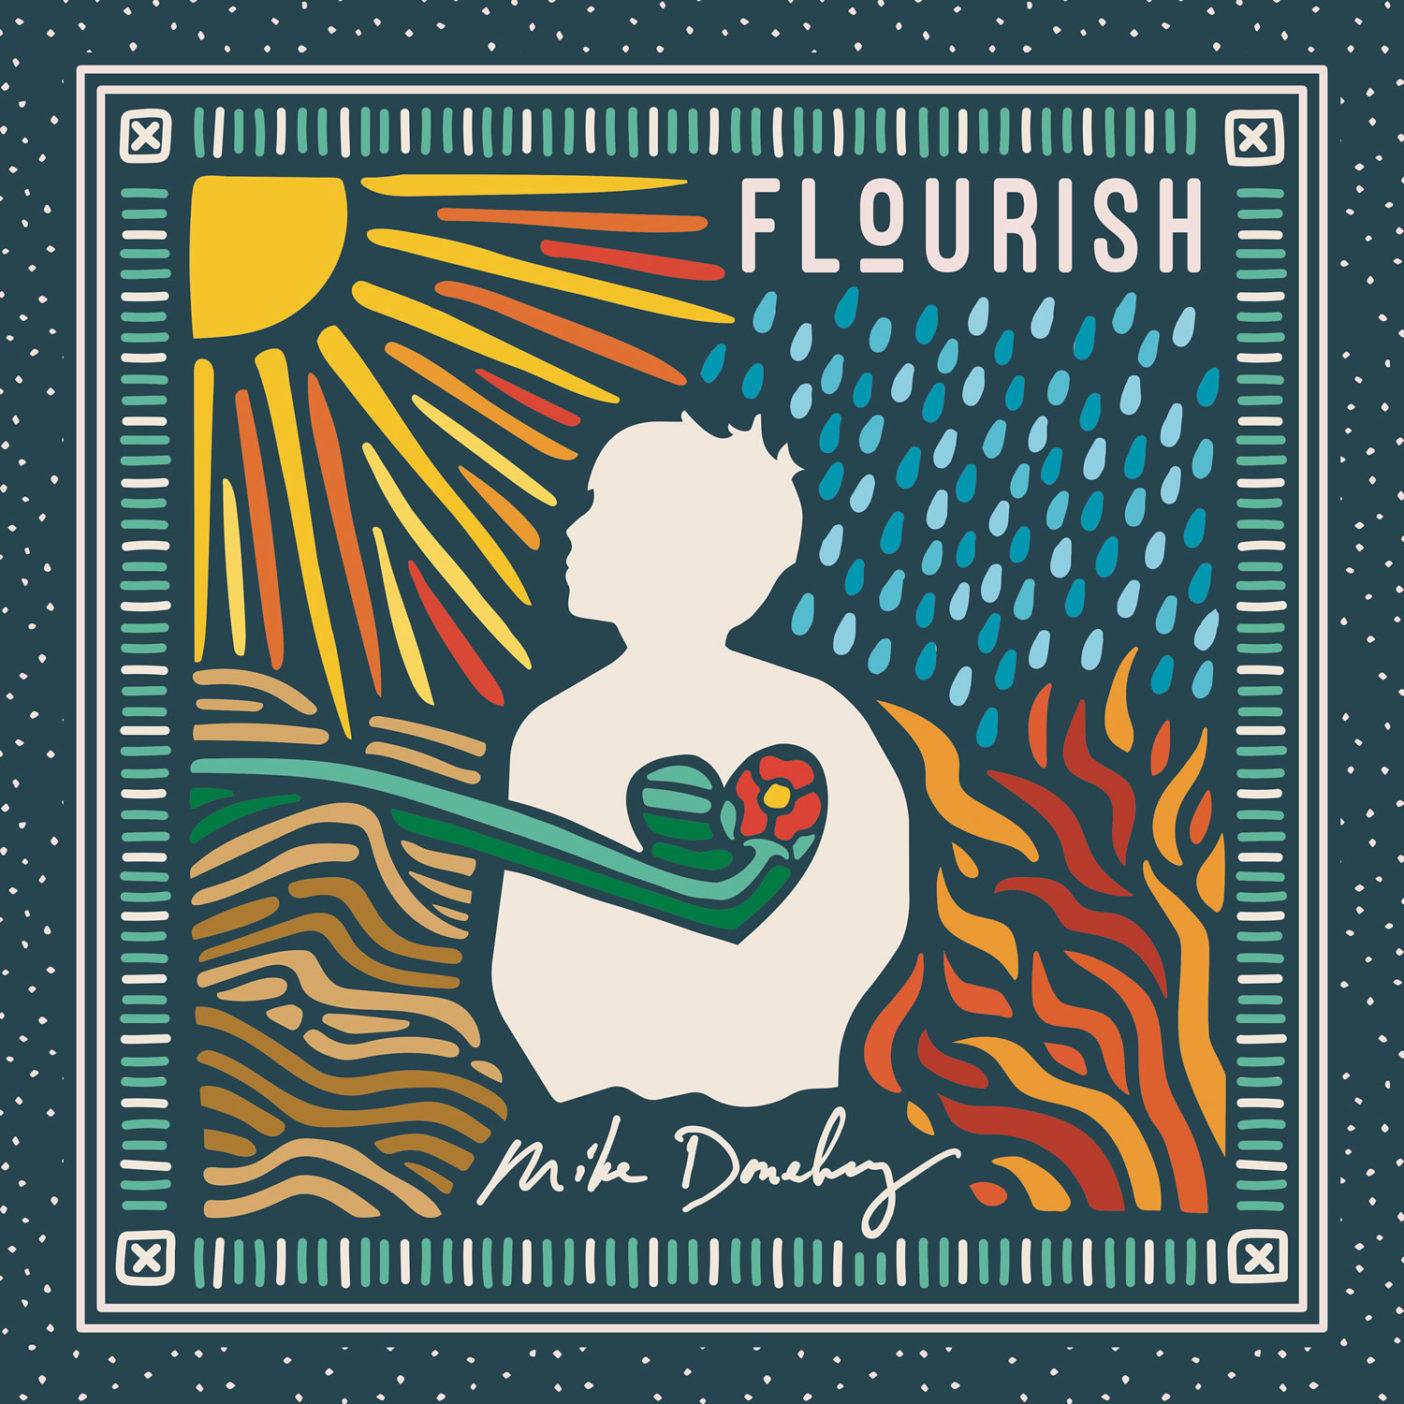 Mike Donehey: Flourish